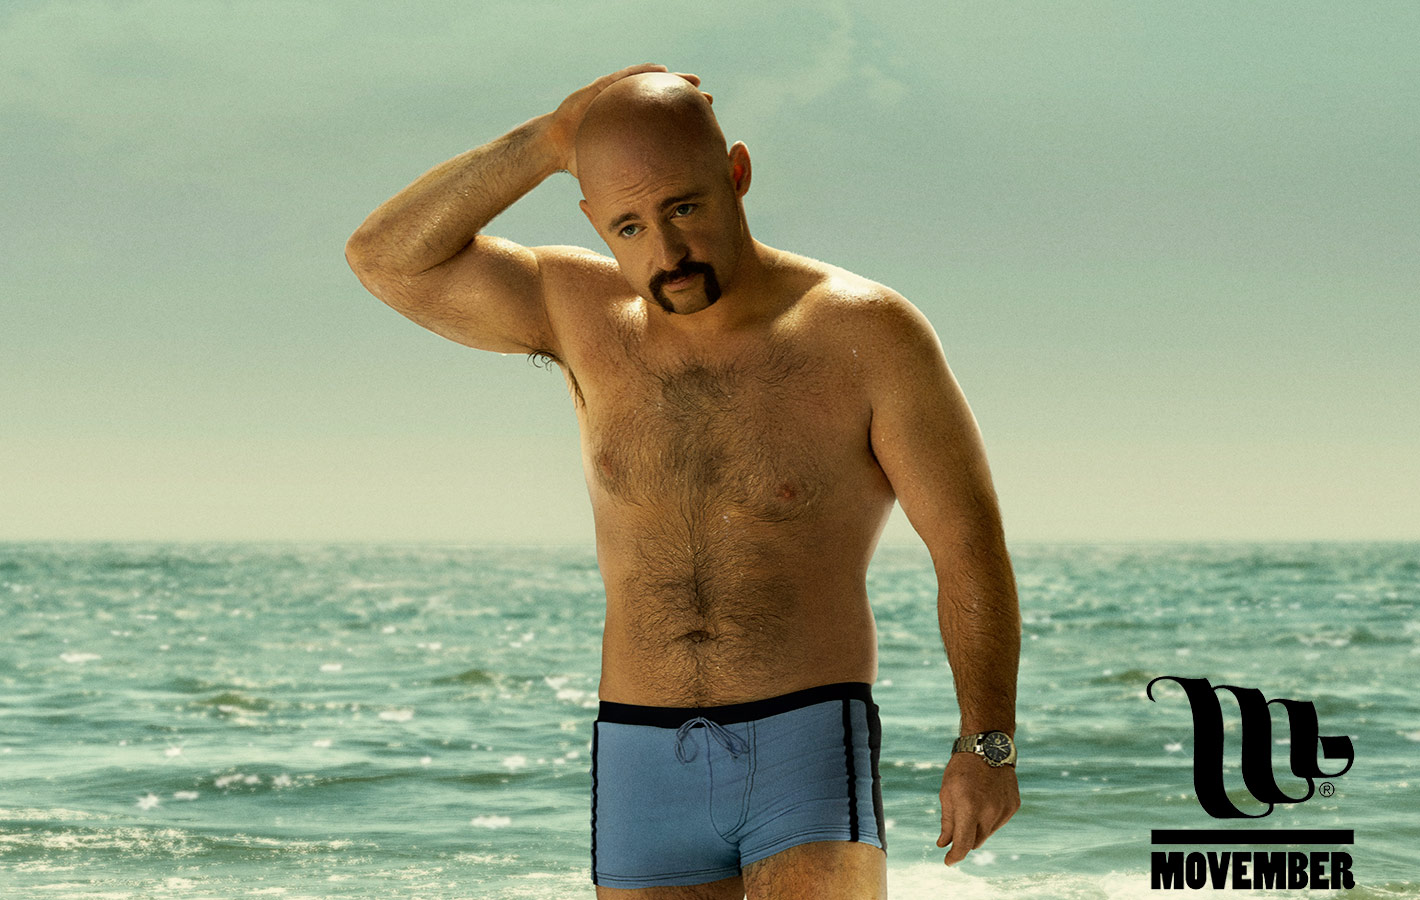 Movember big_bond w LOGO.jpg